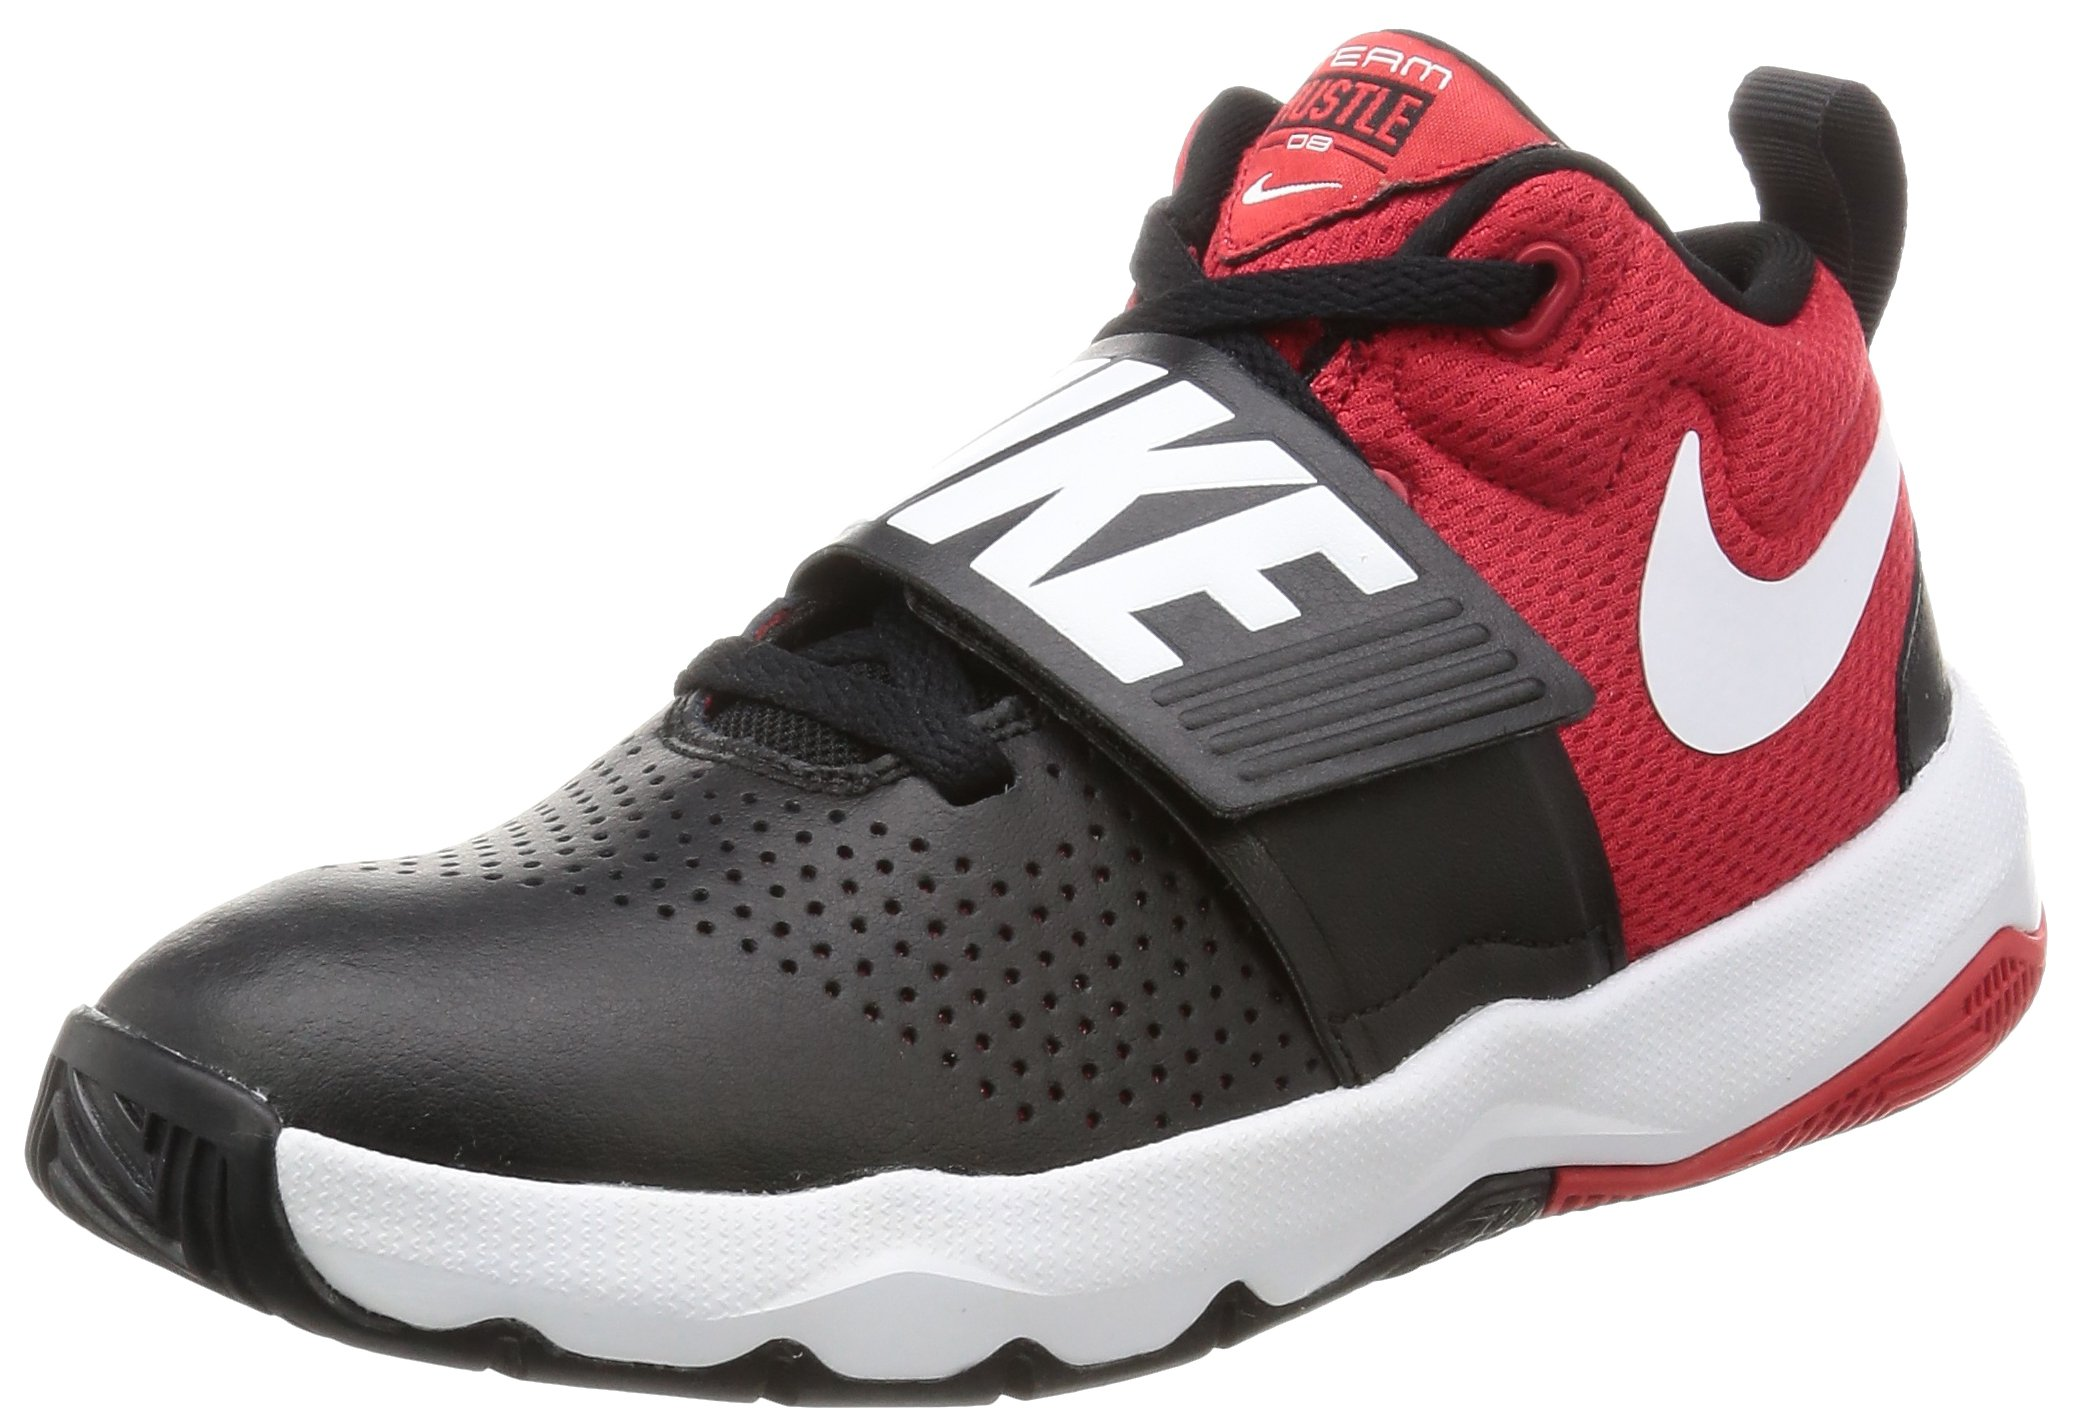 NIKE Boy's Team Hustle D 8 (GS) Basketball Shoe Black/White/University Red Size 6 M US